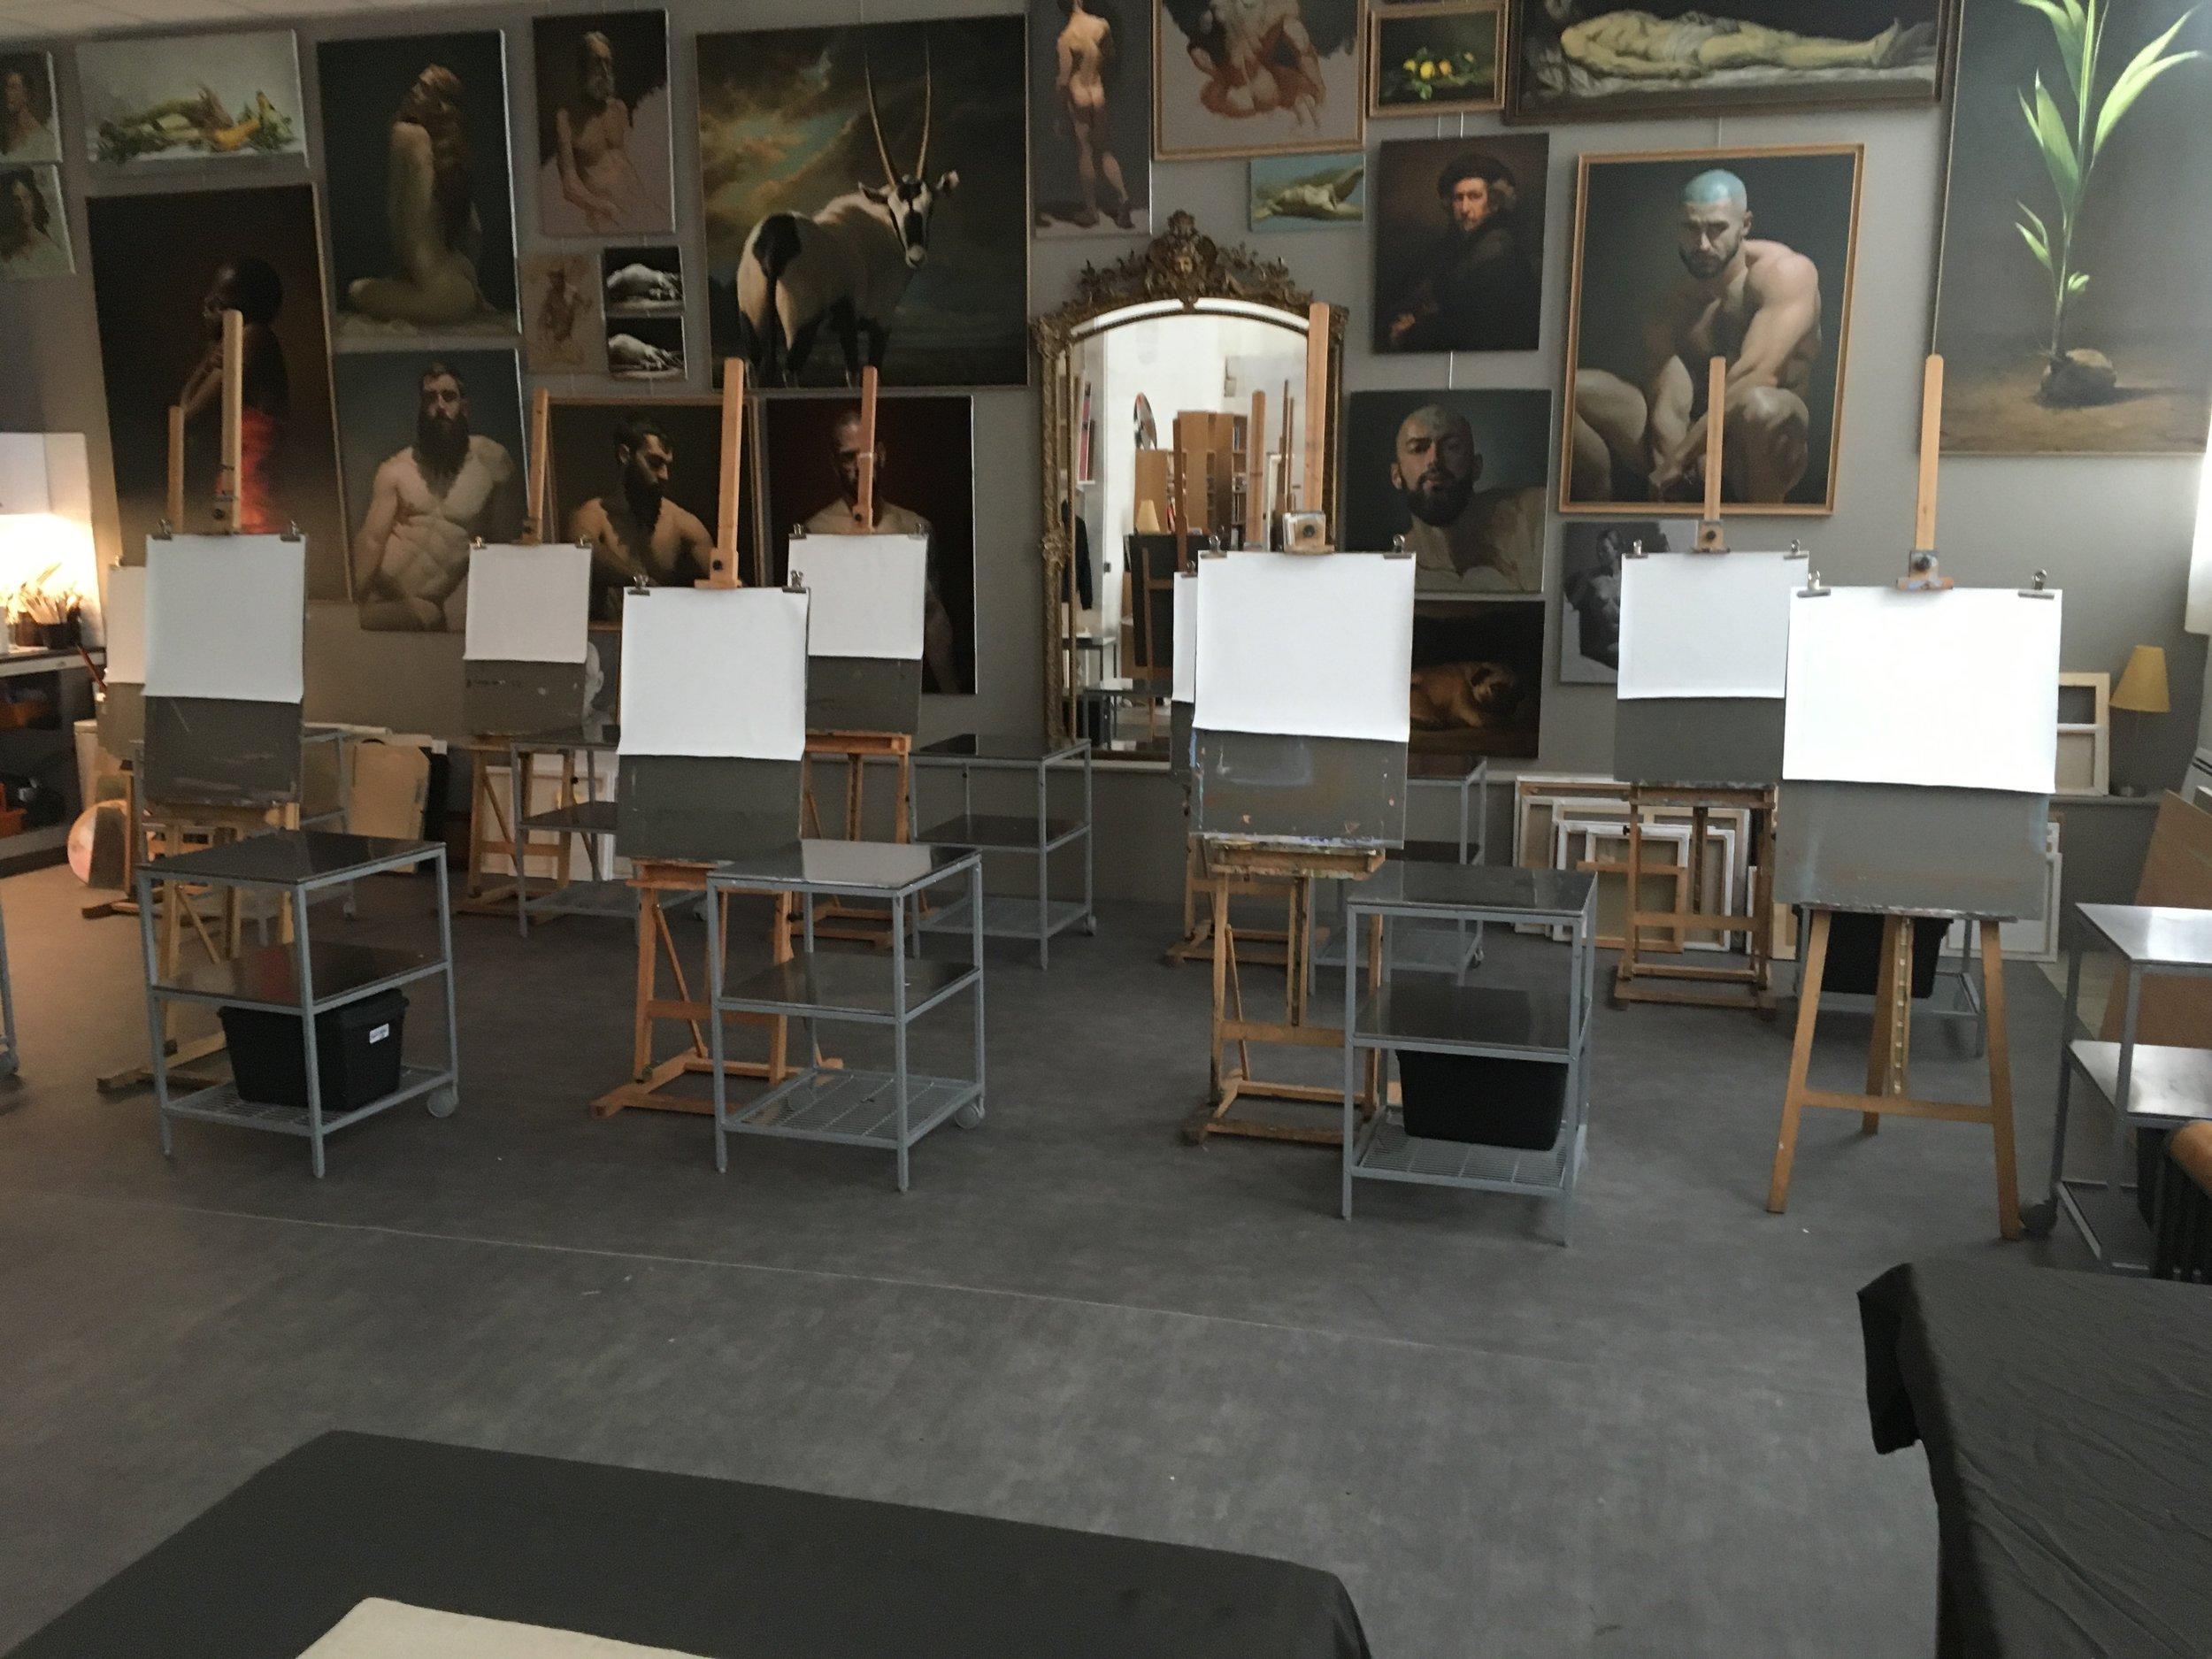 paris-art-class-english.jpg